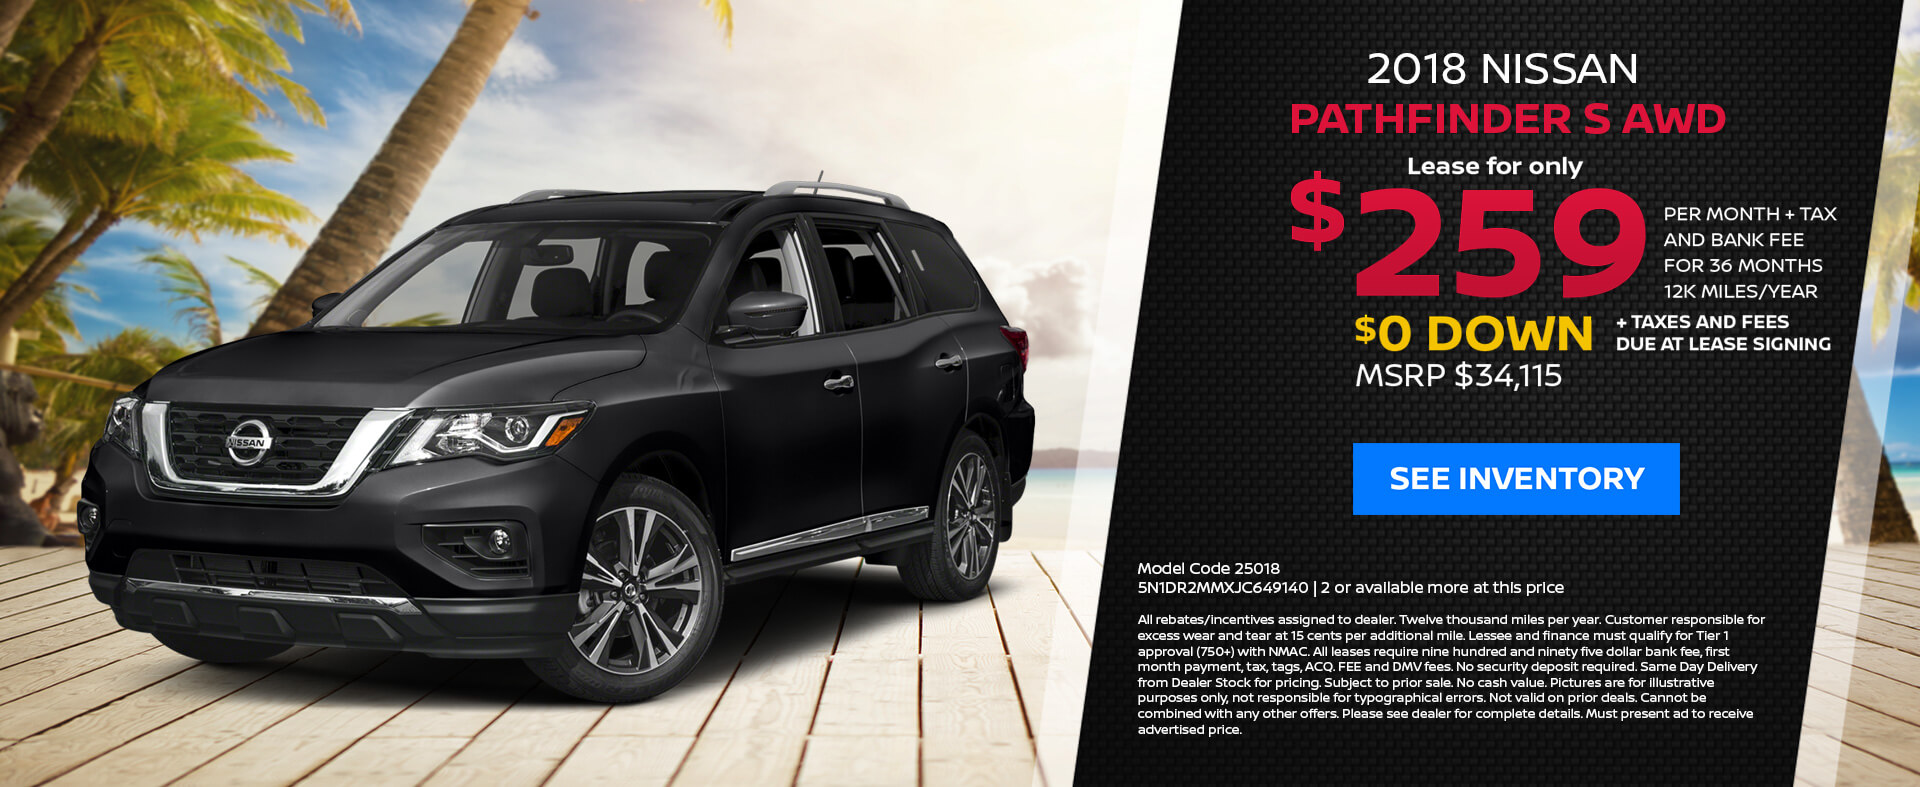 Nissan Pathfinder $259 Lease